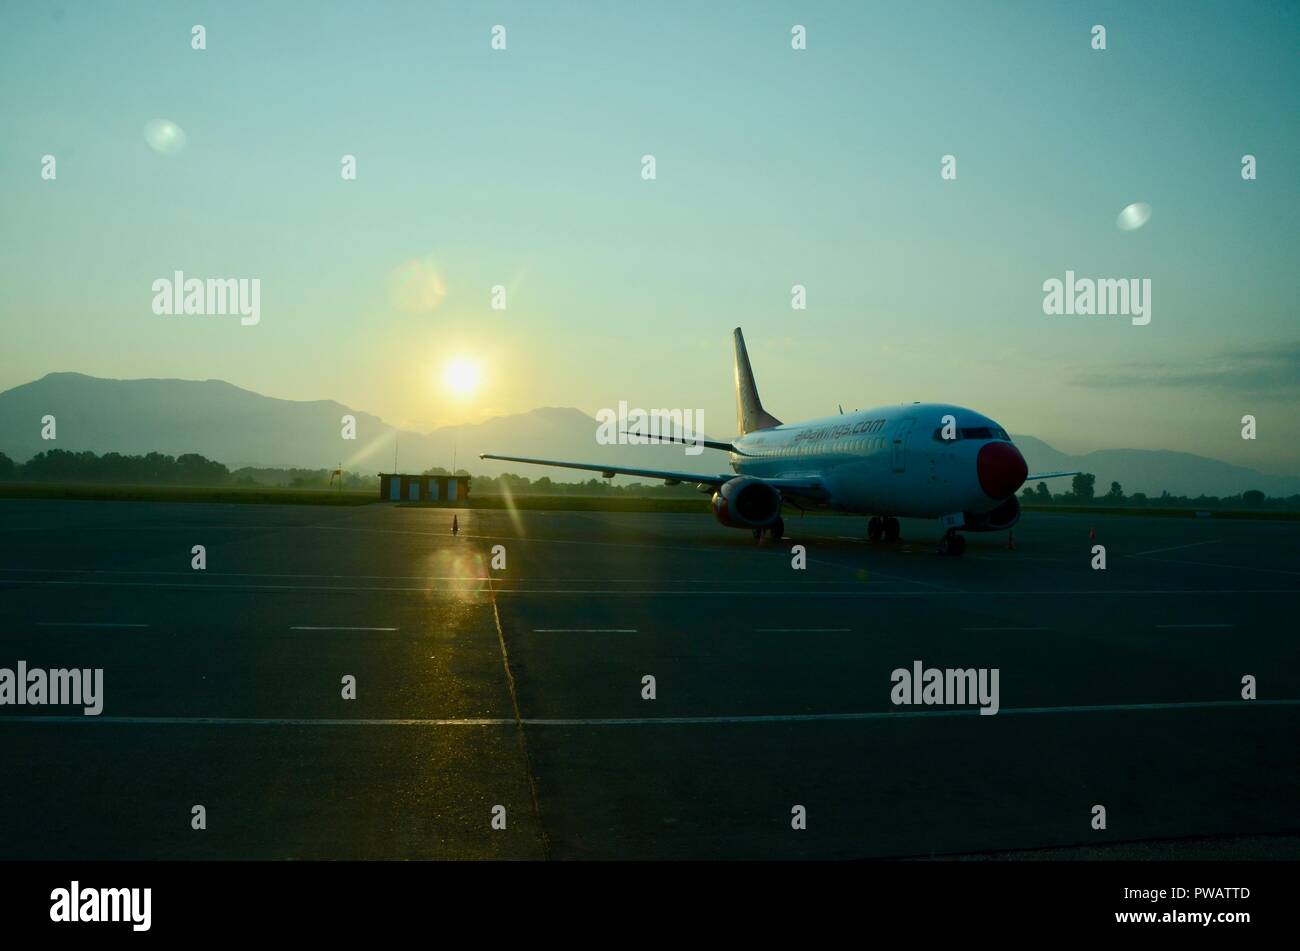 an albawings.com airplane on the tarmac at tirana airport at sunrise - Stock Image